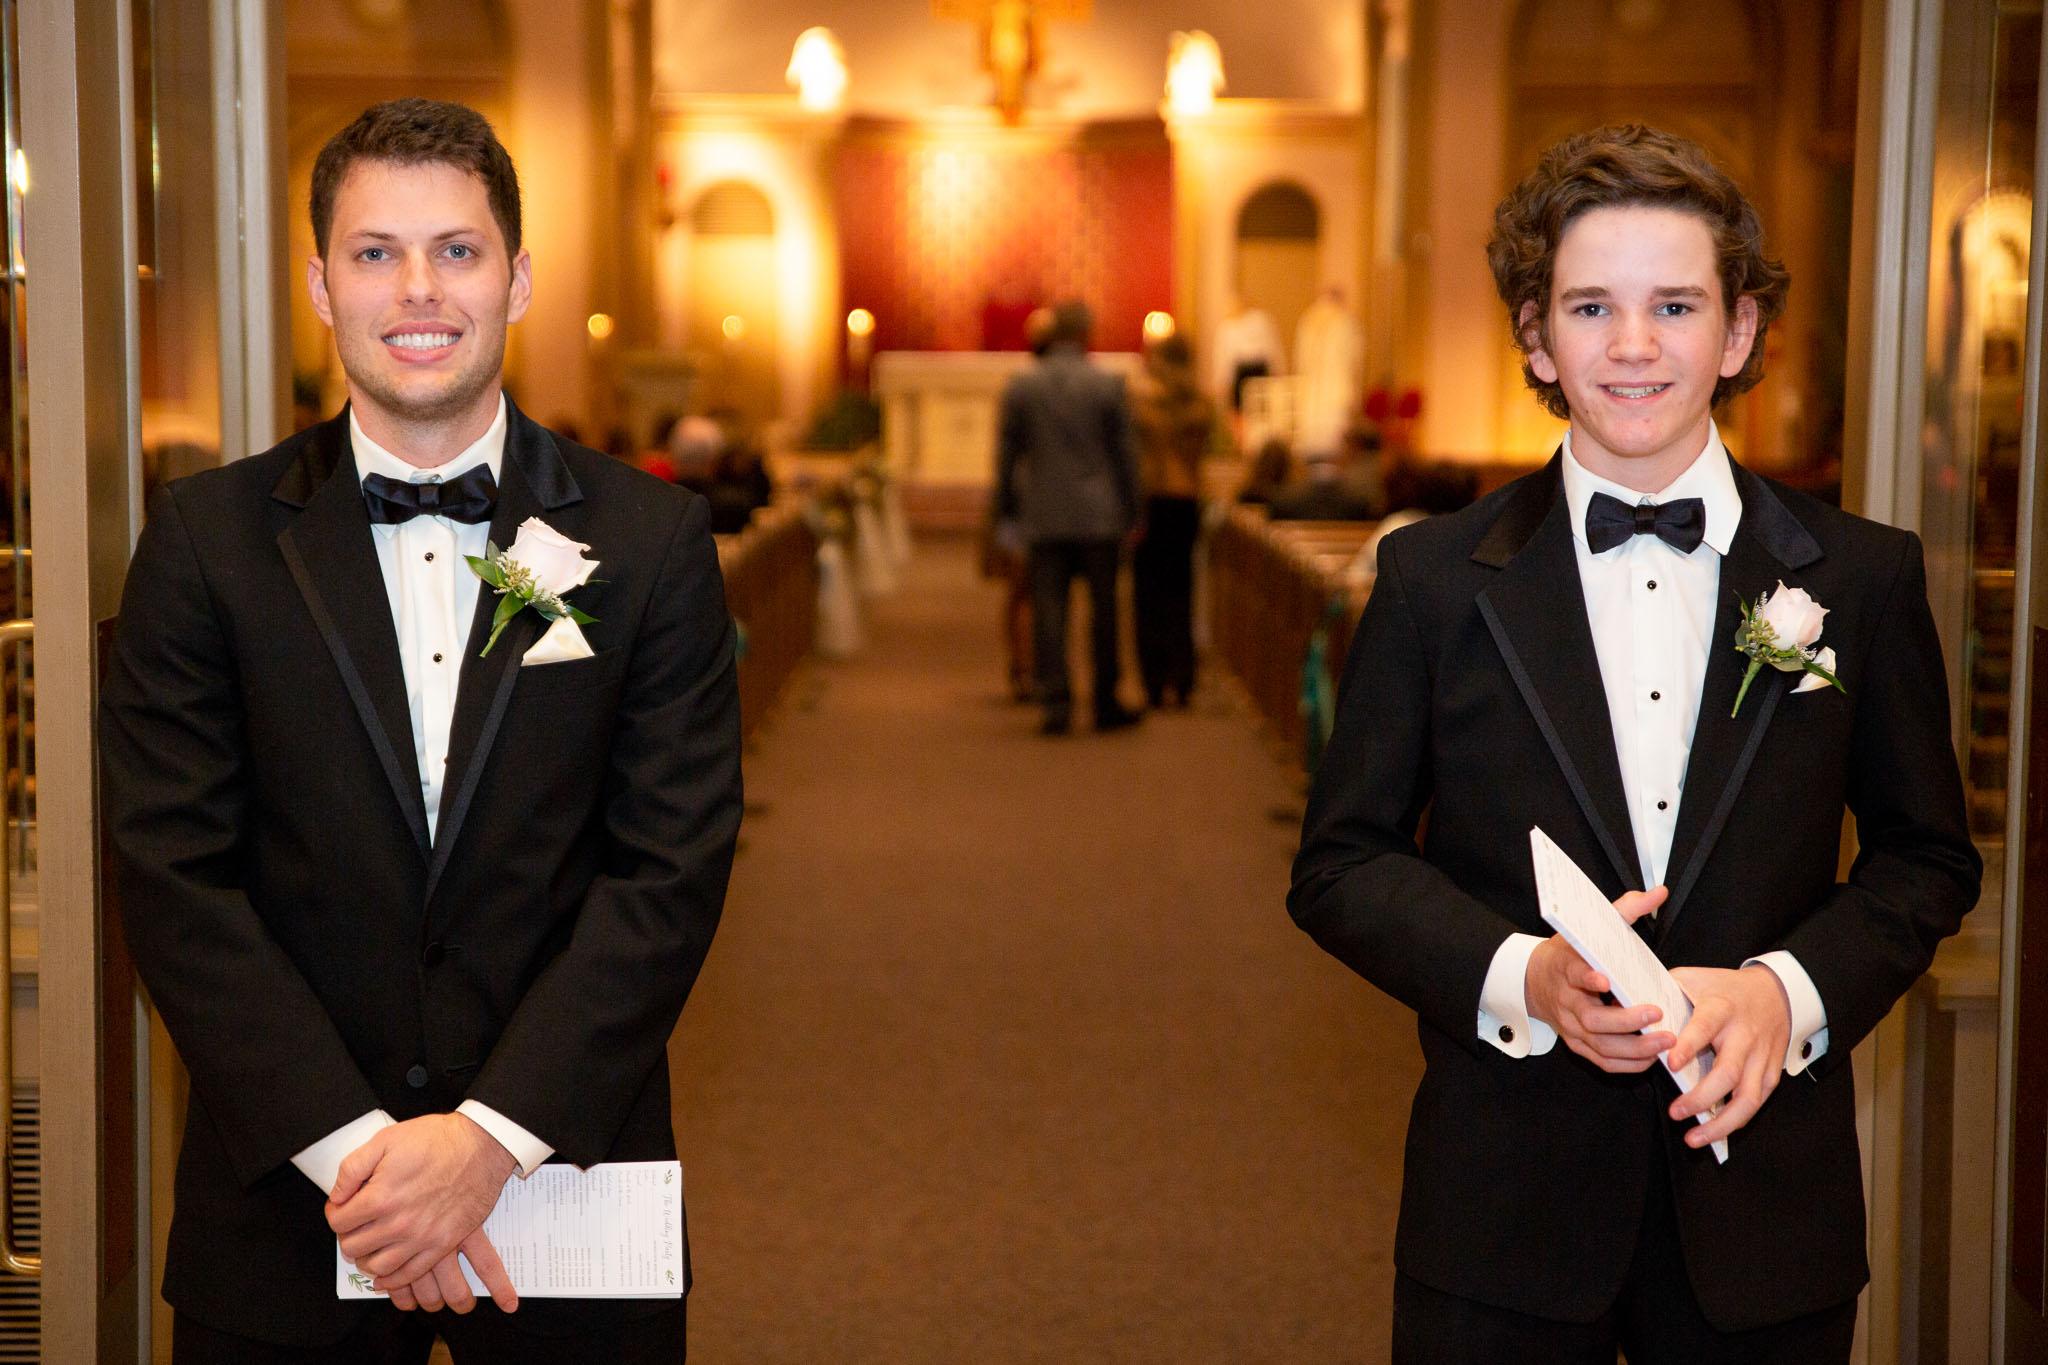 st charles borromeo catholic parish wedding (22 of 17).JPG